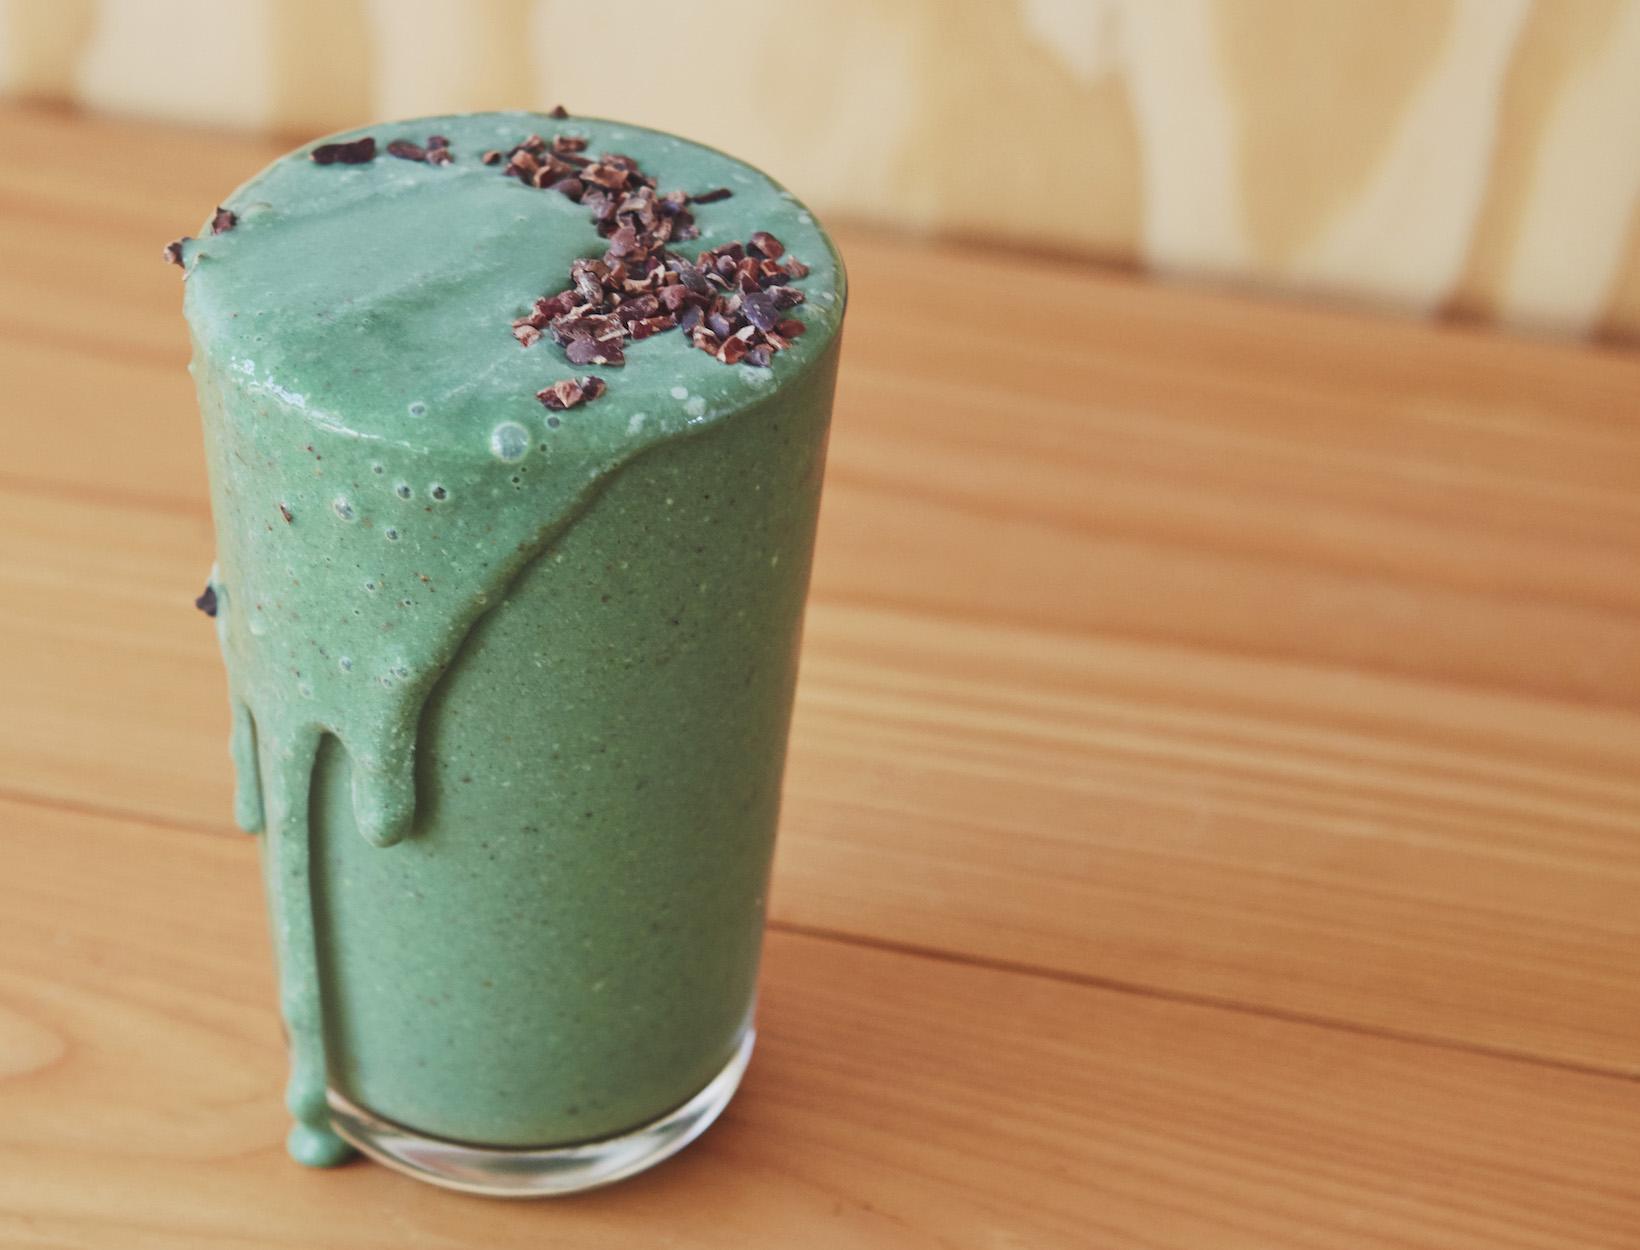 A Morning Chlorella Smoothie That Actually Tastes Good